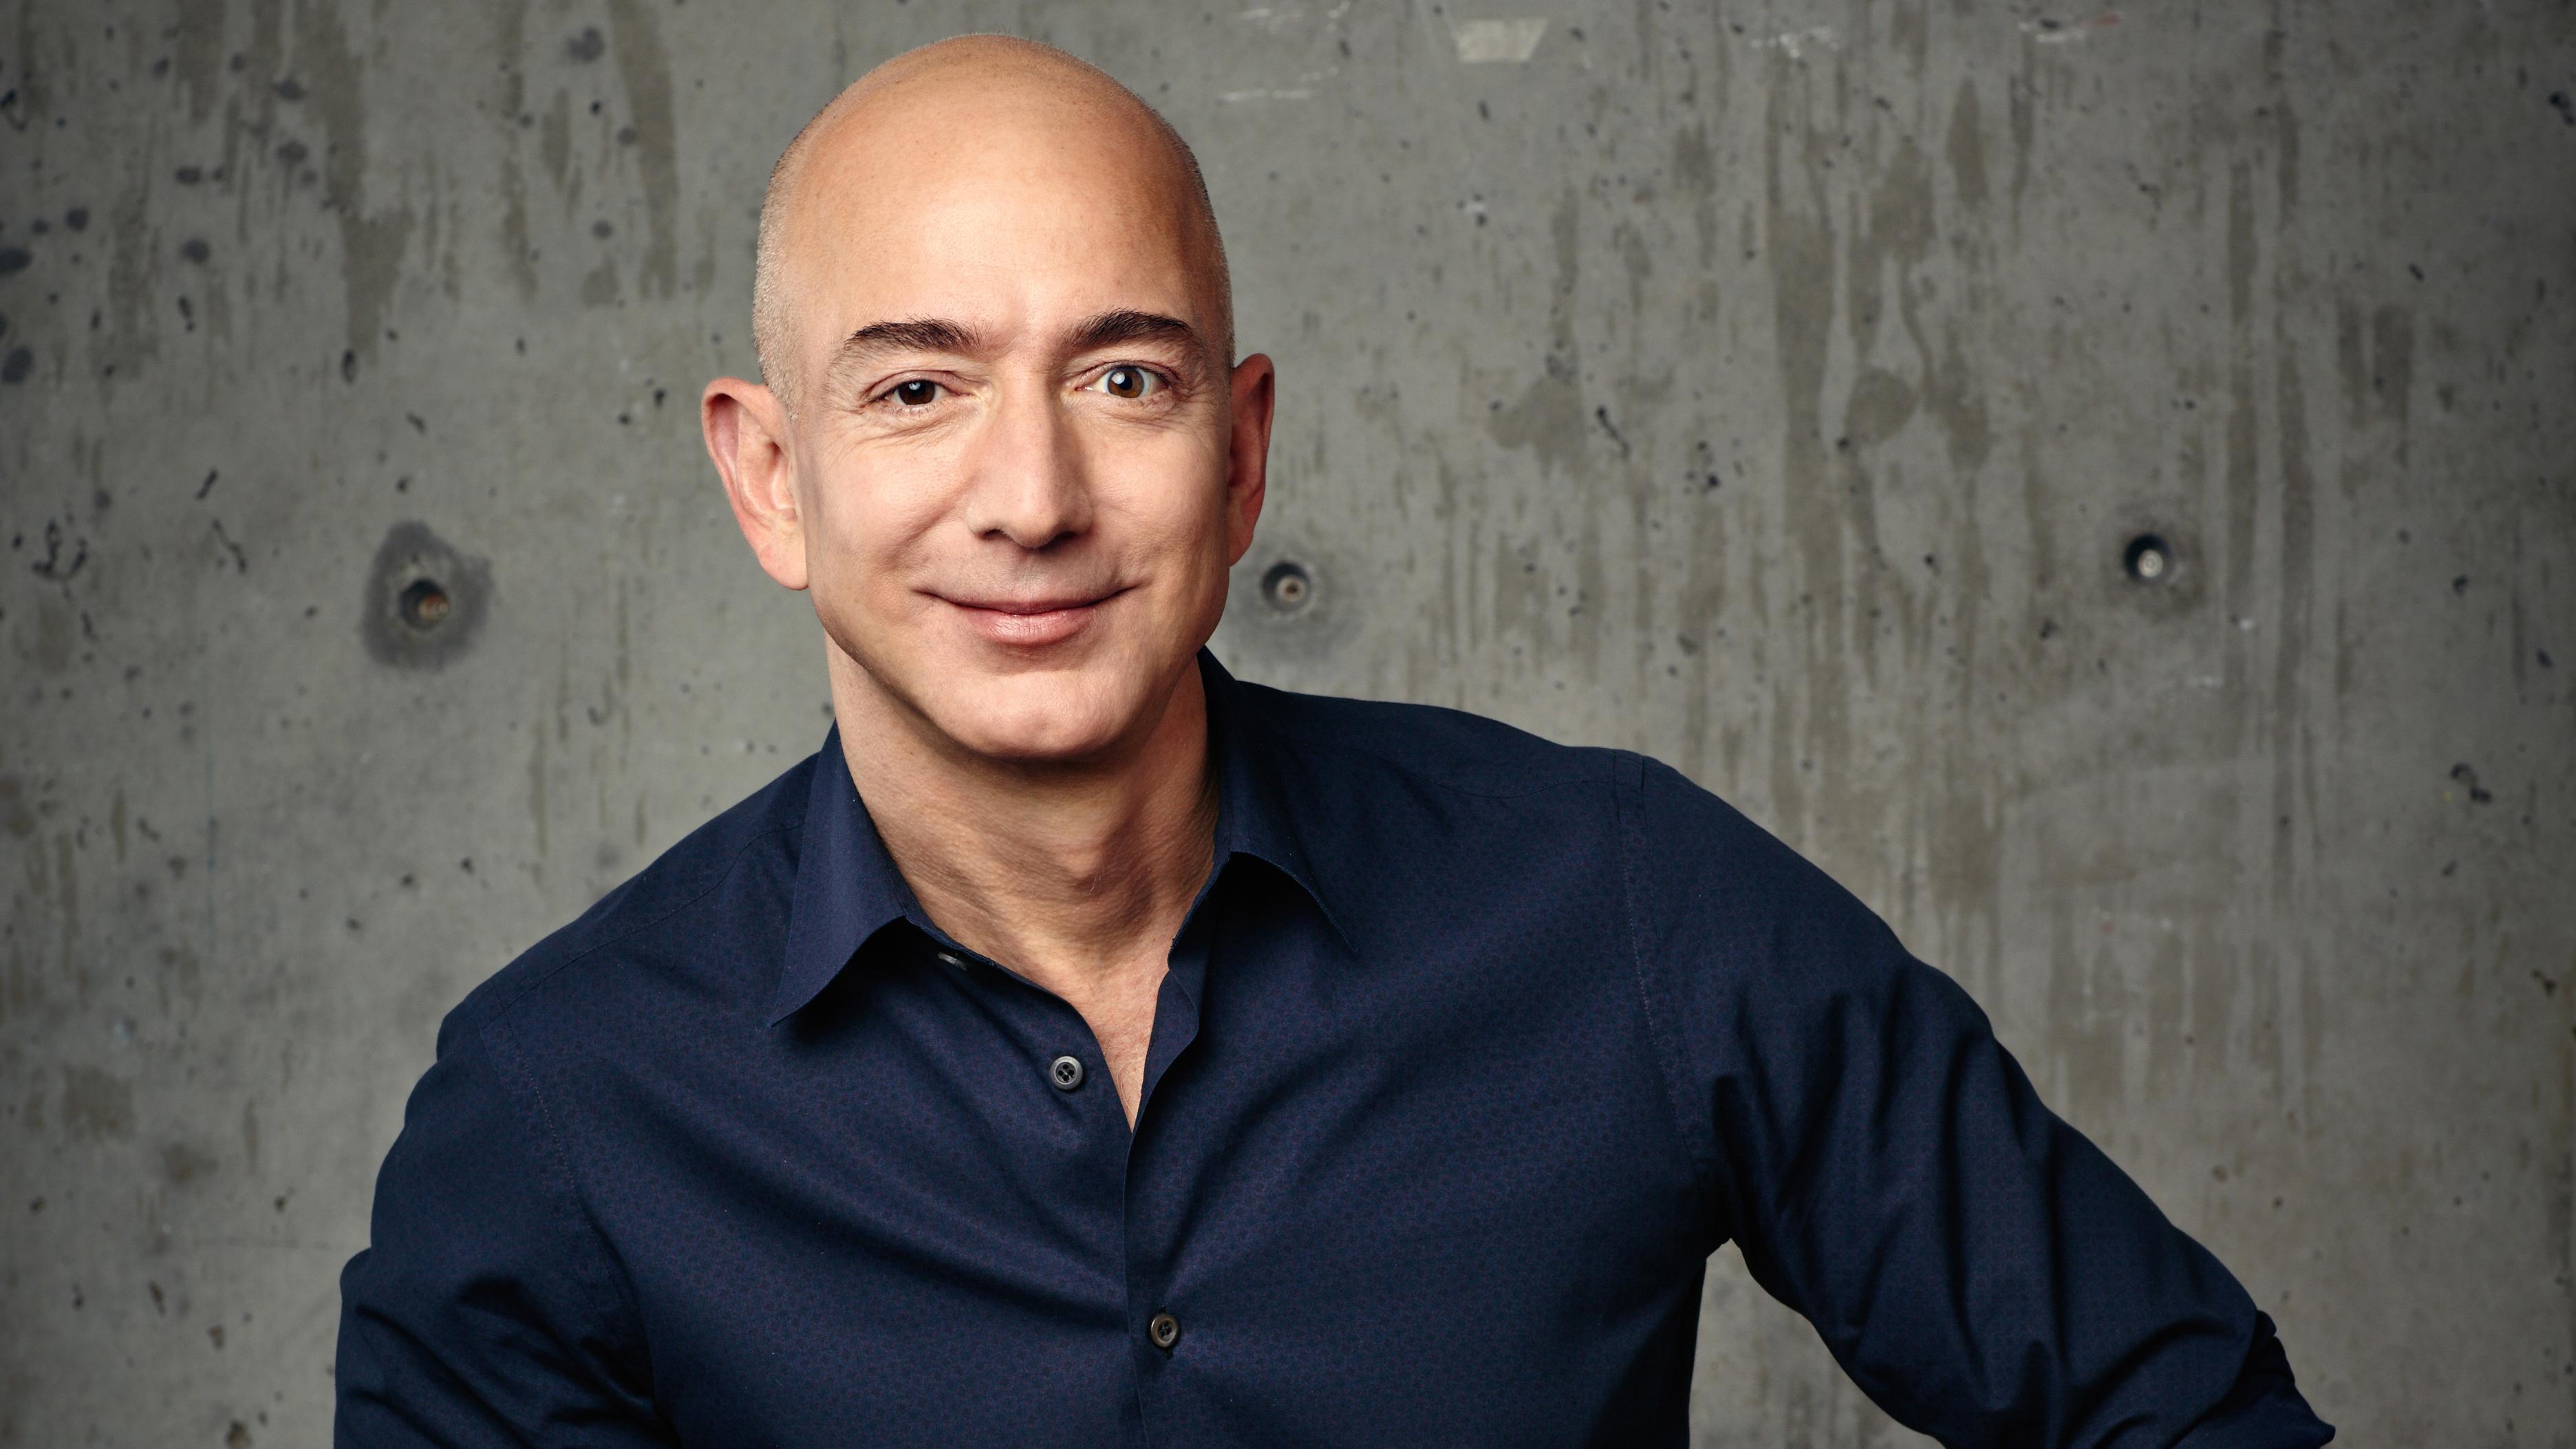 Jeff Bezos Hd Celebrities 4k Wallpapers Images Backgrounds